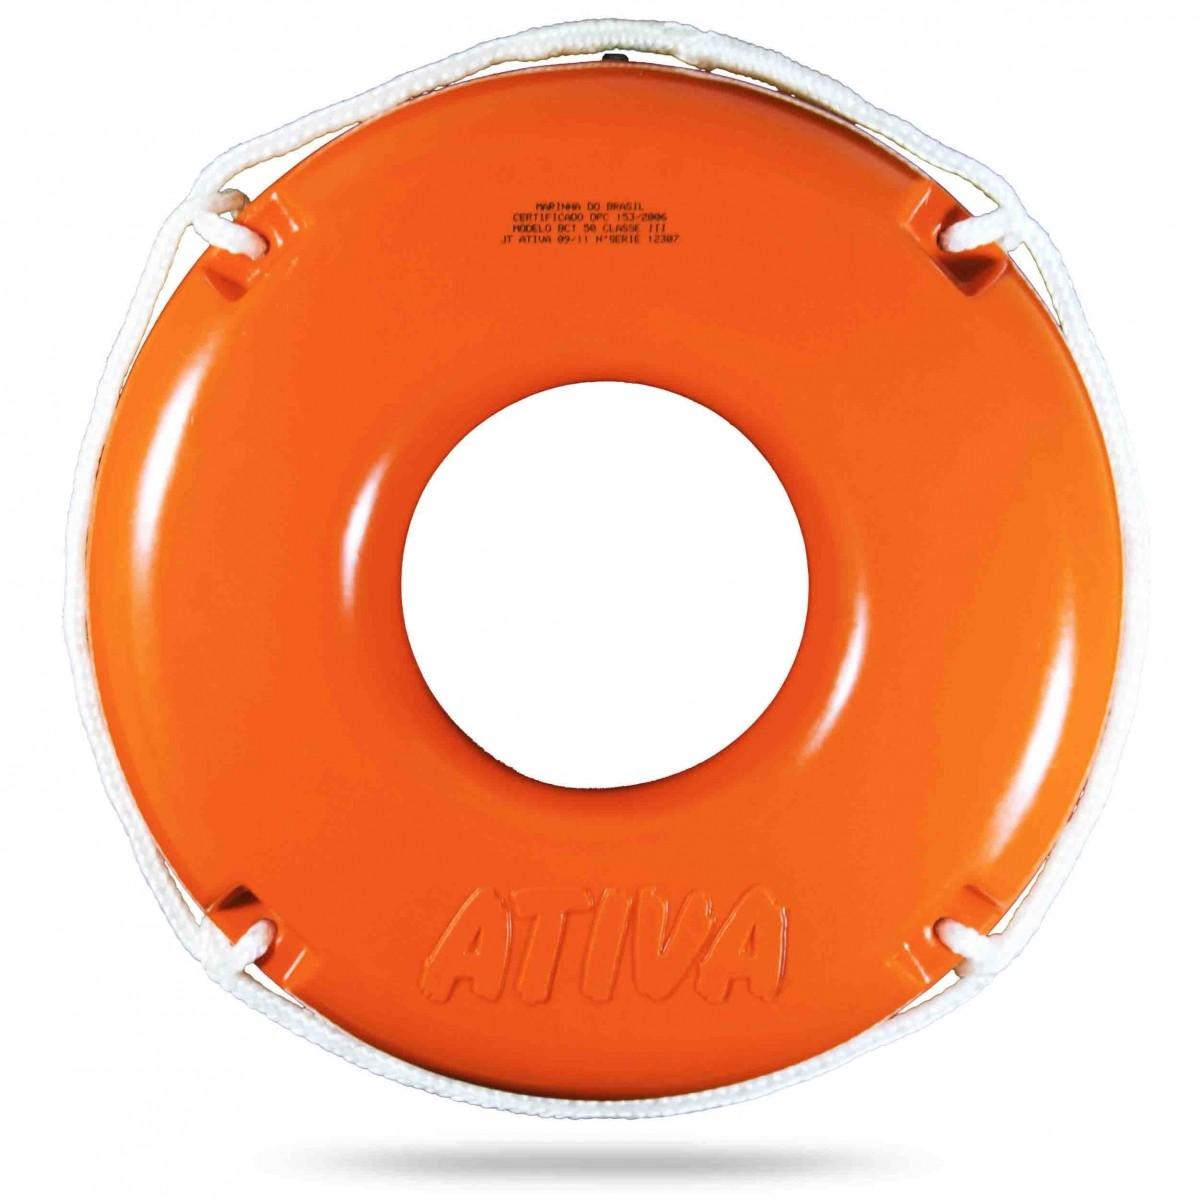 Boia Salva-Vidas Classe III  - Radical Peças - Peças para Jet Ski